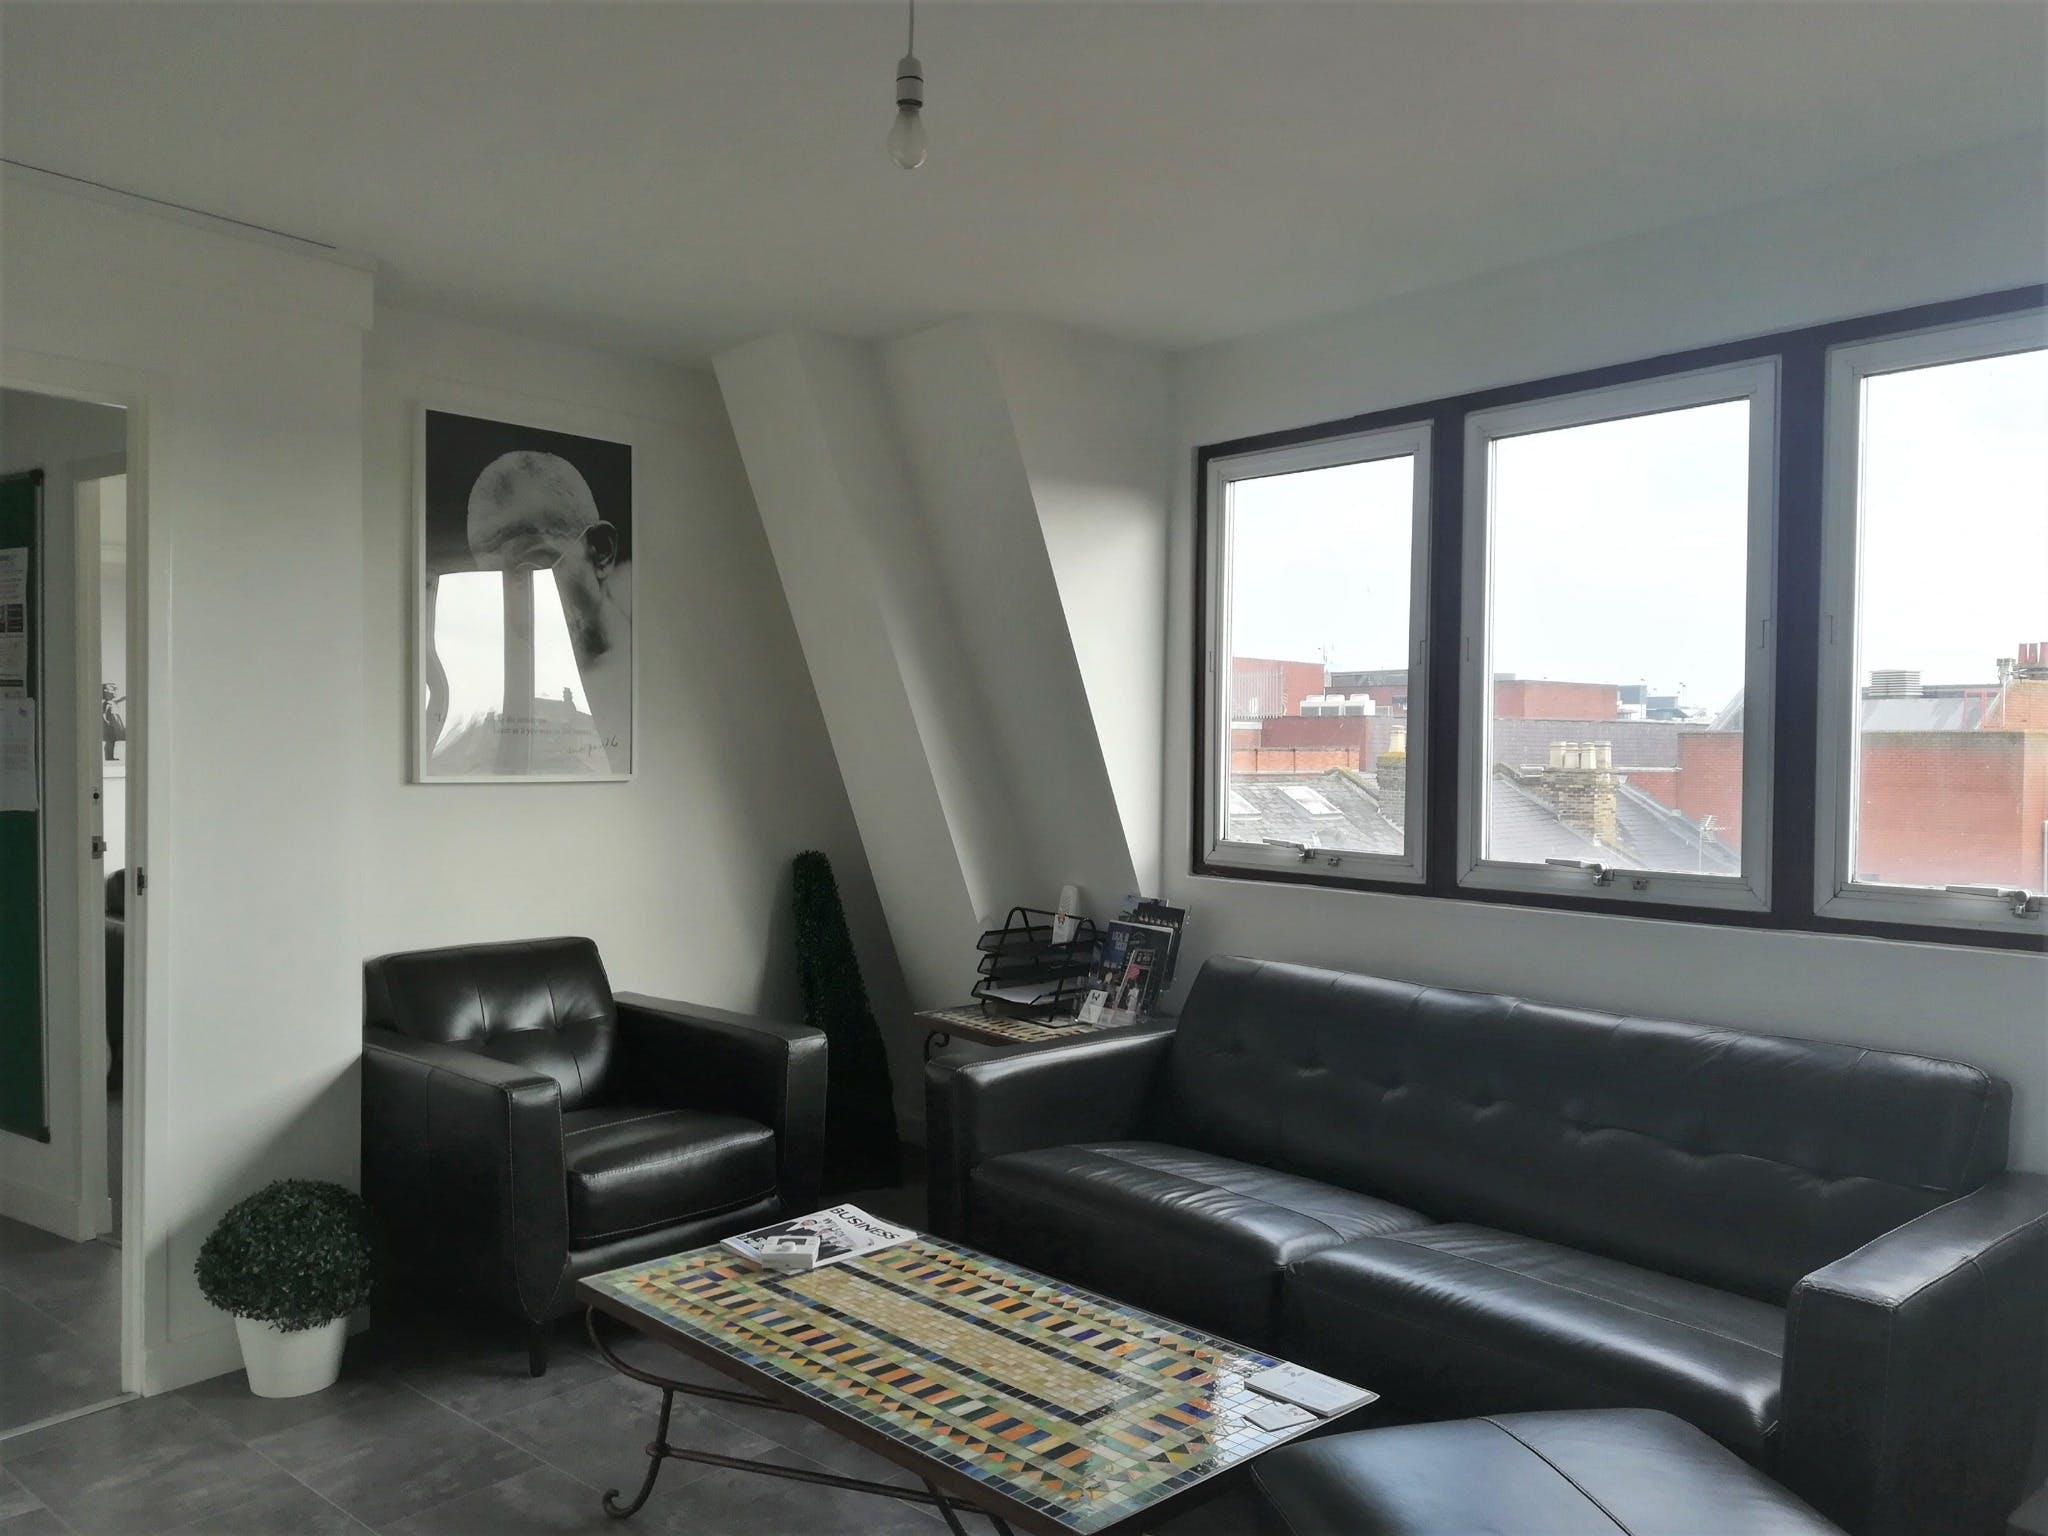 Third Floor, 69 High Street, Maidenhead, Offices To Let - aa8d54eb275b81afa1499f6c8053d7183dc8caab.jpg